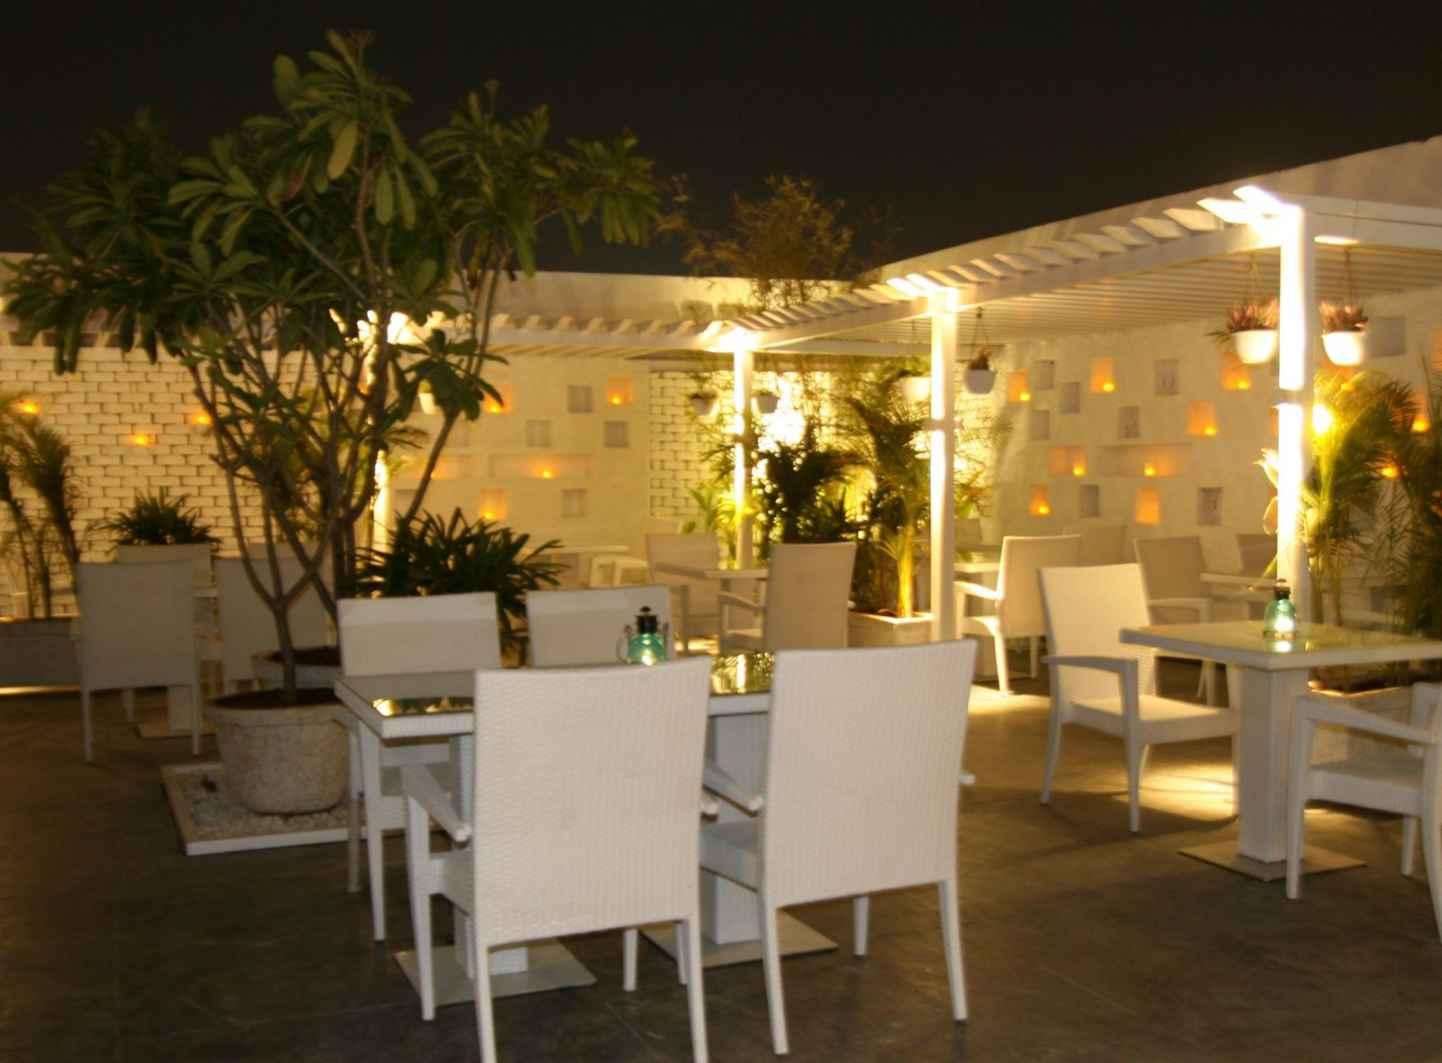 Little Italy Hitech City_Romantic Restaurants in Hyderabad